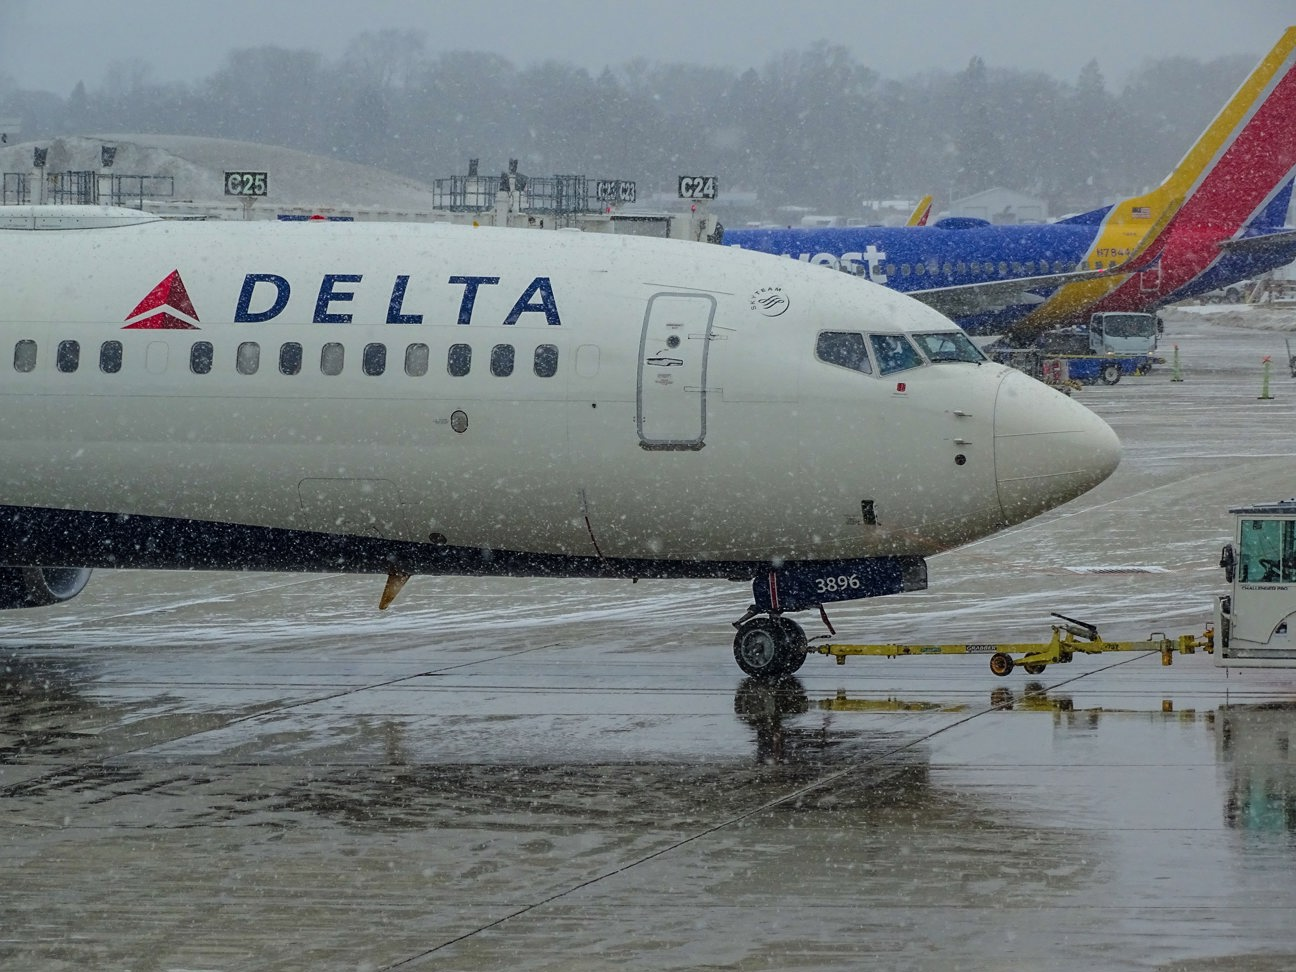 Delta stock, DAL stock, airline stocks